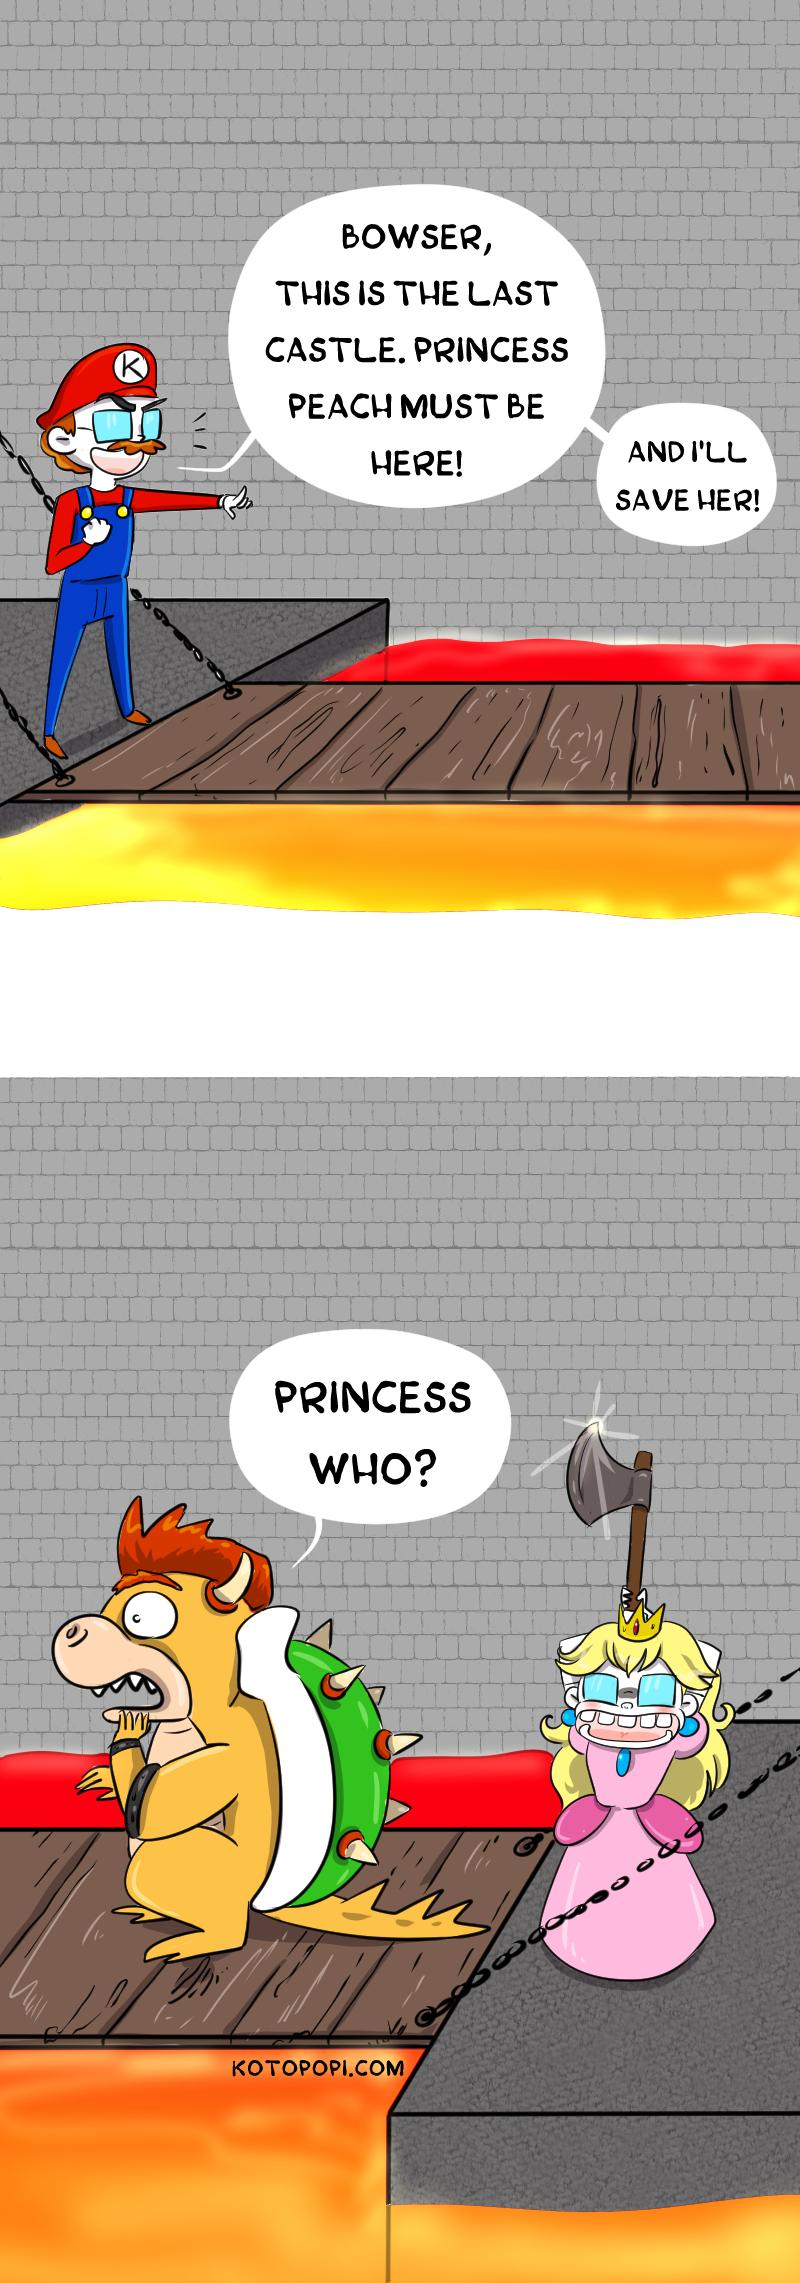 super mario funny parody comics funny images meme memes